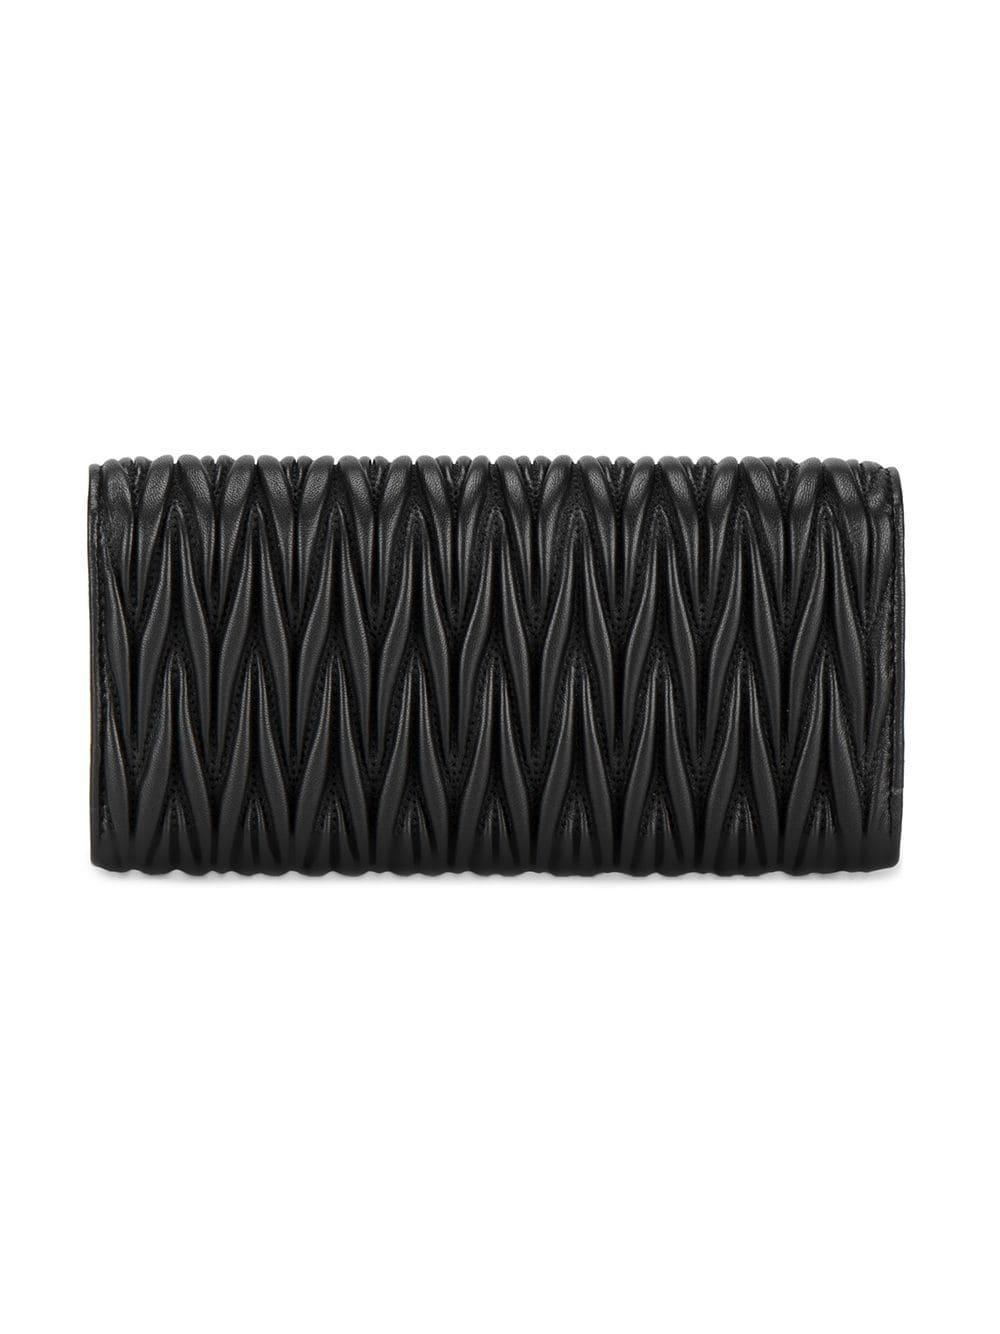 0822f9a01d65 Lyst - Miu Miu Matelassé Leather Wallet in Black